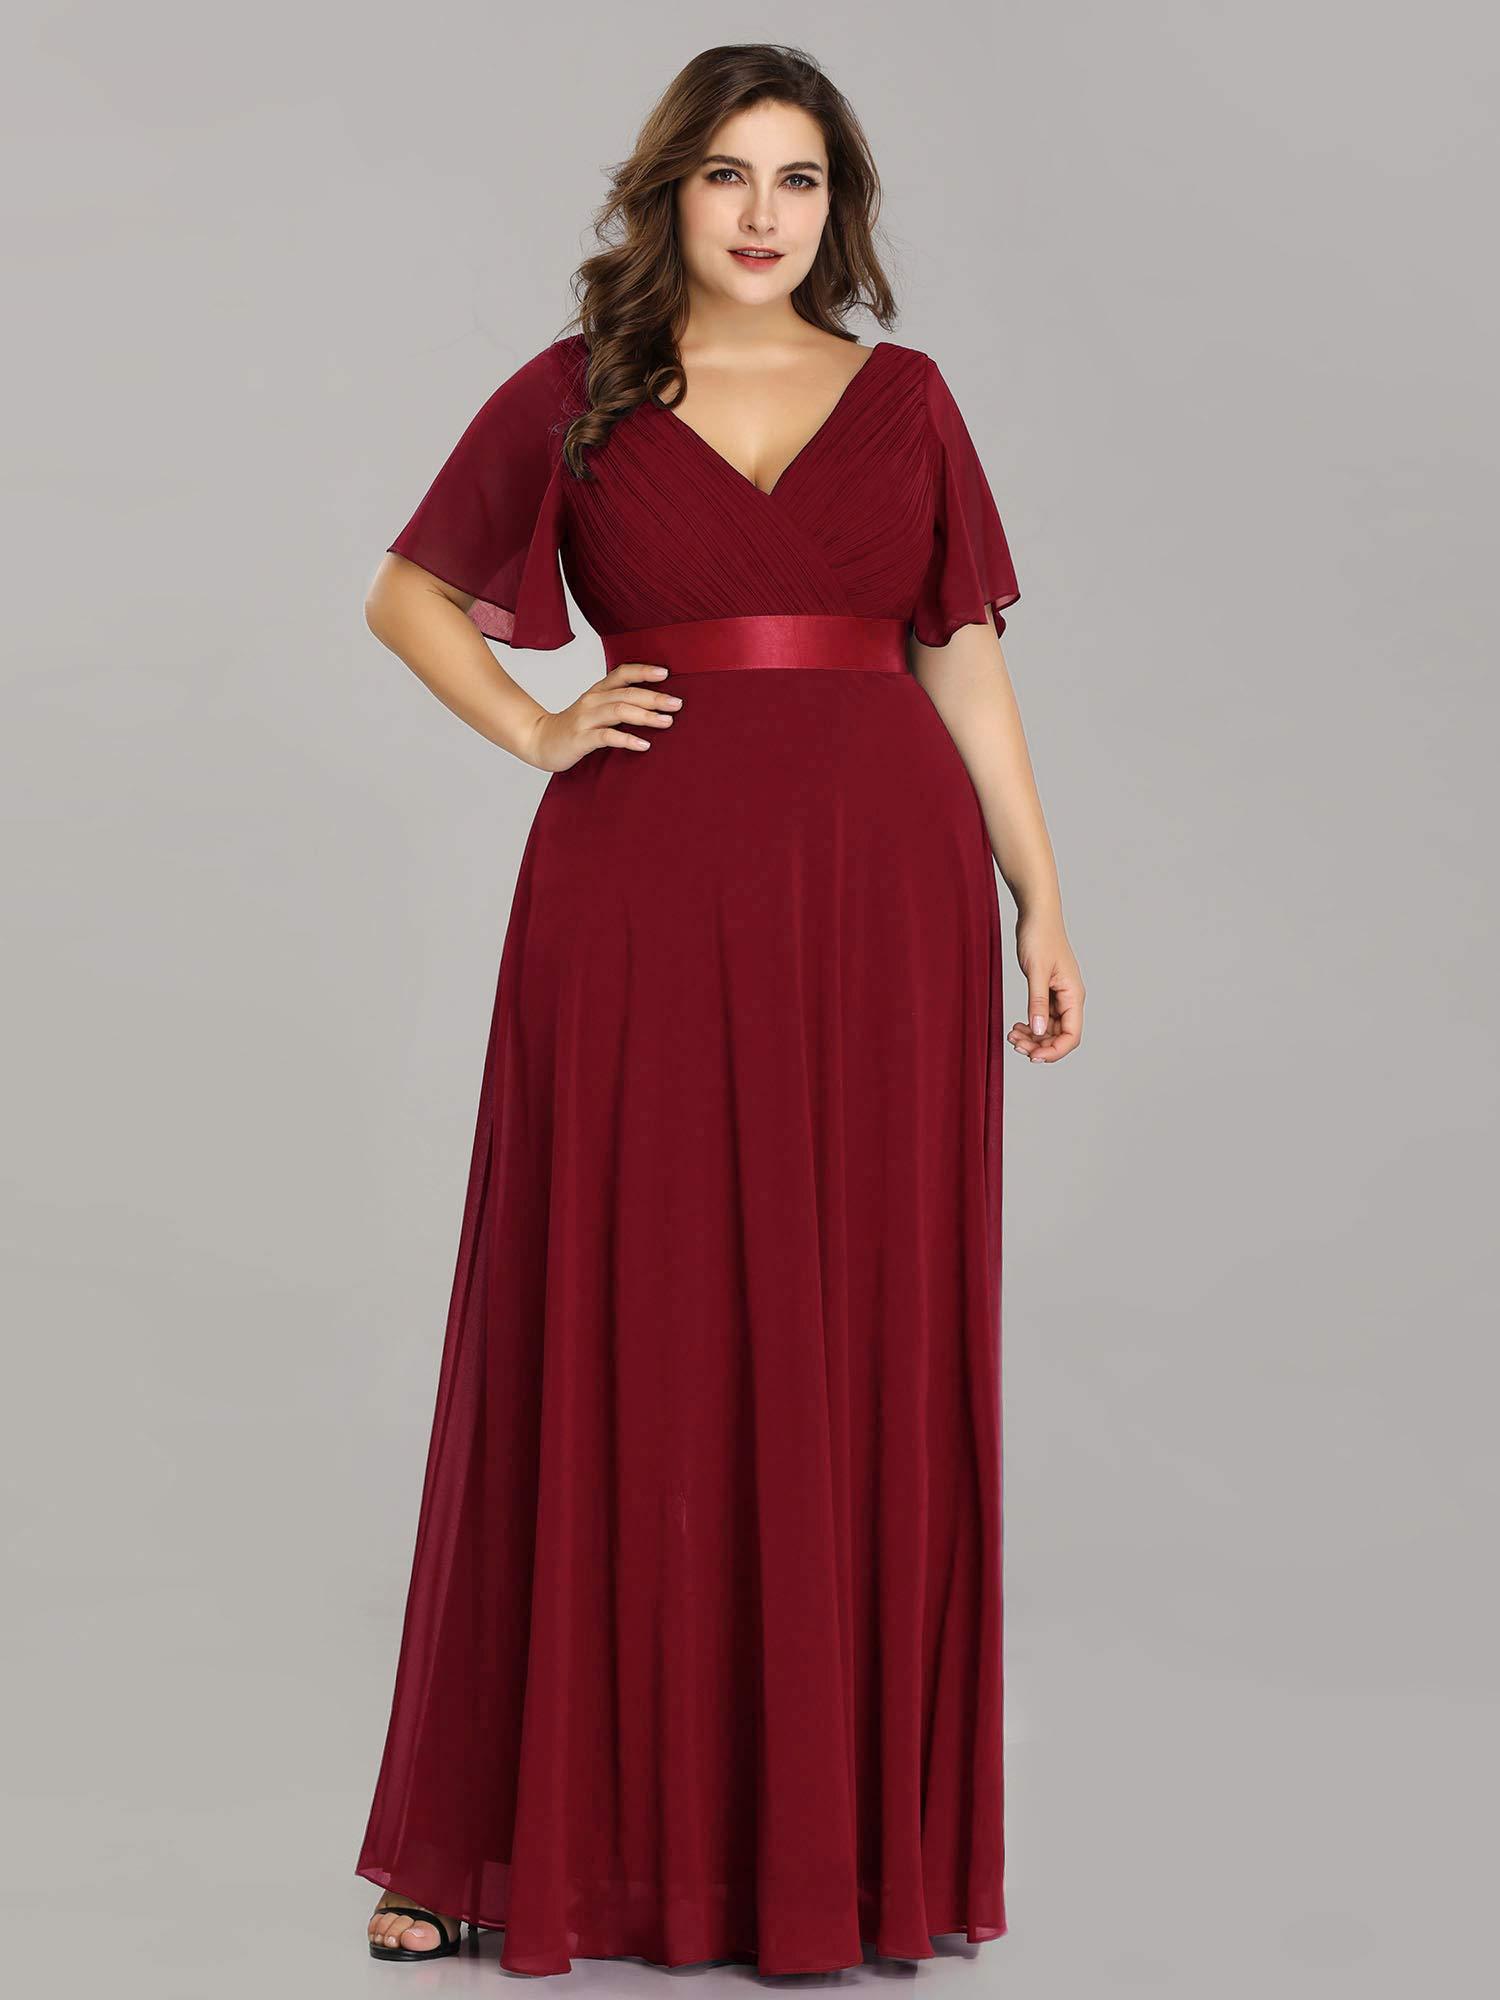 Alisapan Womens A-Line Bridesmaid Dress Plus Size Formal Evening Dresses  Burgundy US20